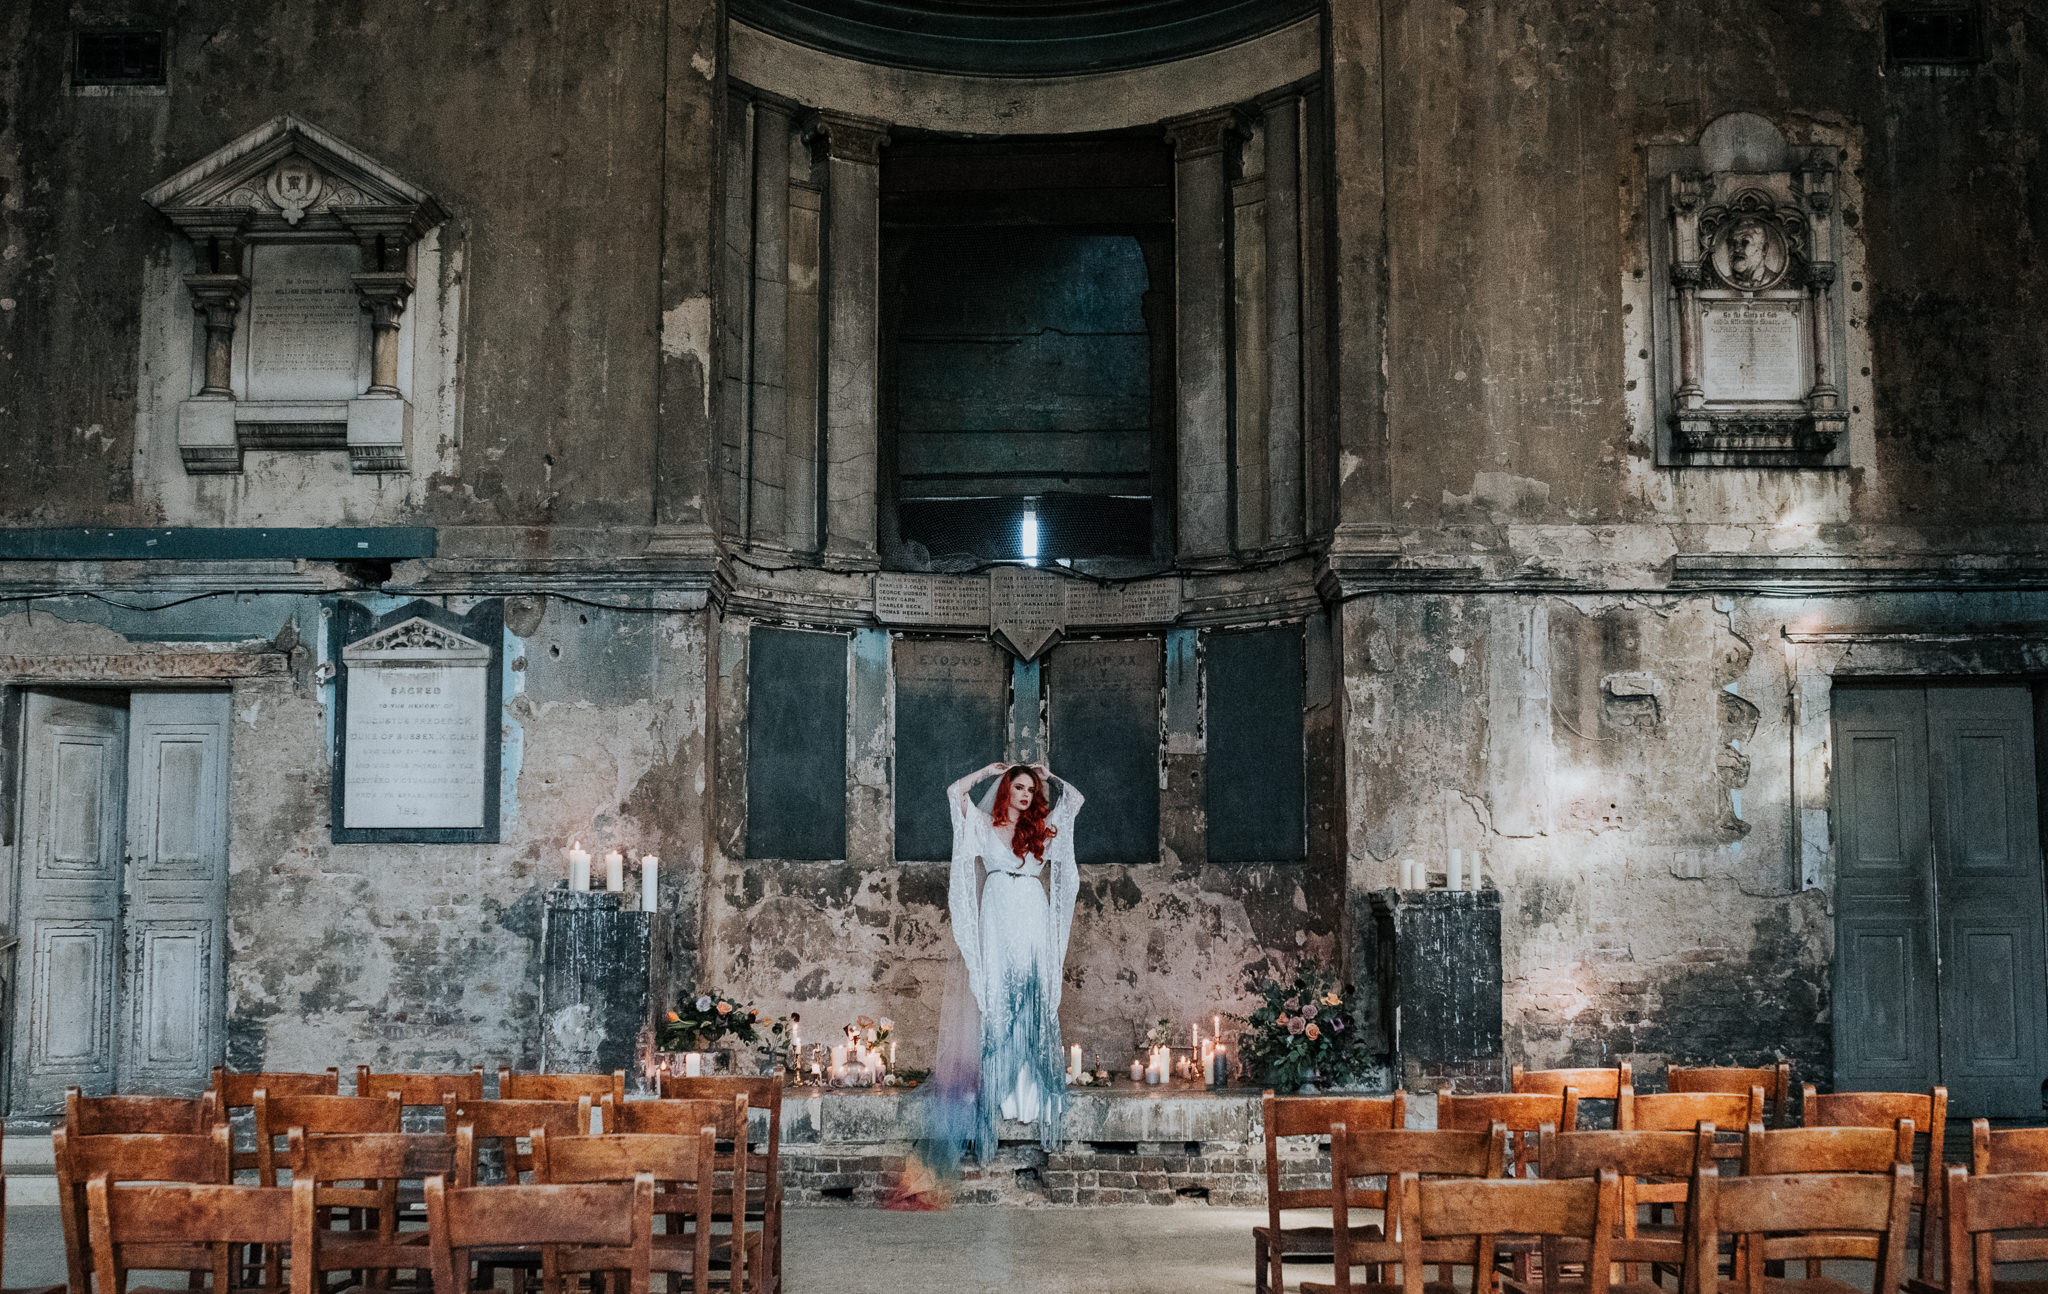 alternative chapel wedding- asylum london- unique london wedding venue- london wedding venue- Jenny Appleton Photography- unique wedding dress- alternative wedding dress- dip dye wedding dress- alternative wedding venue